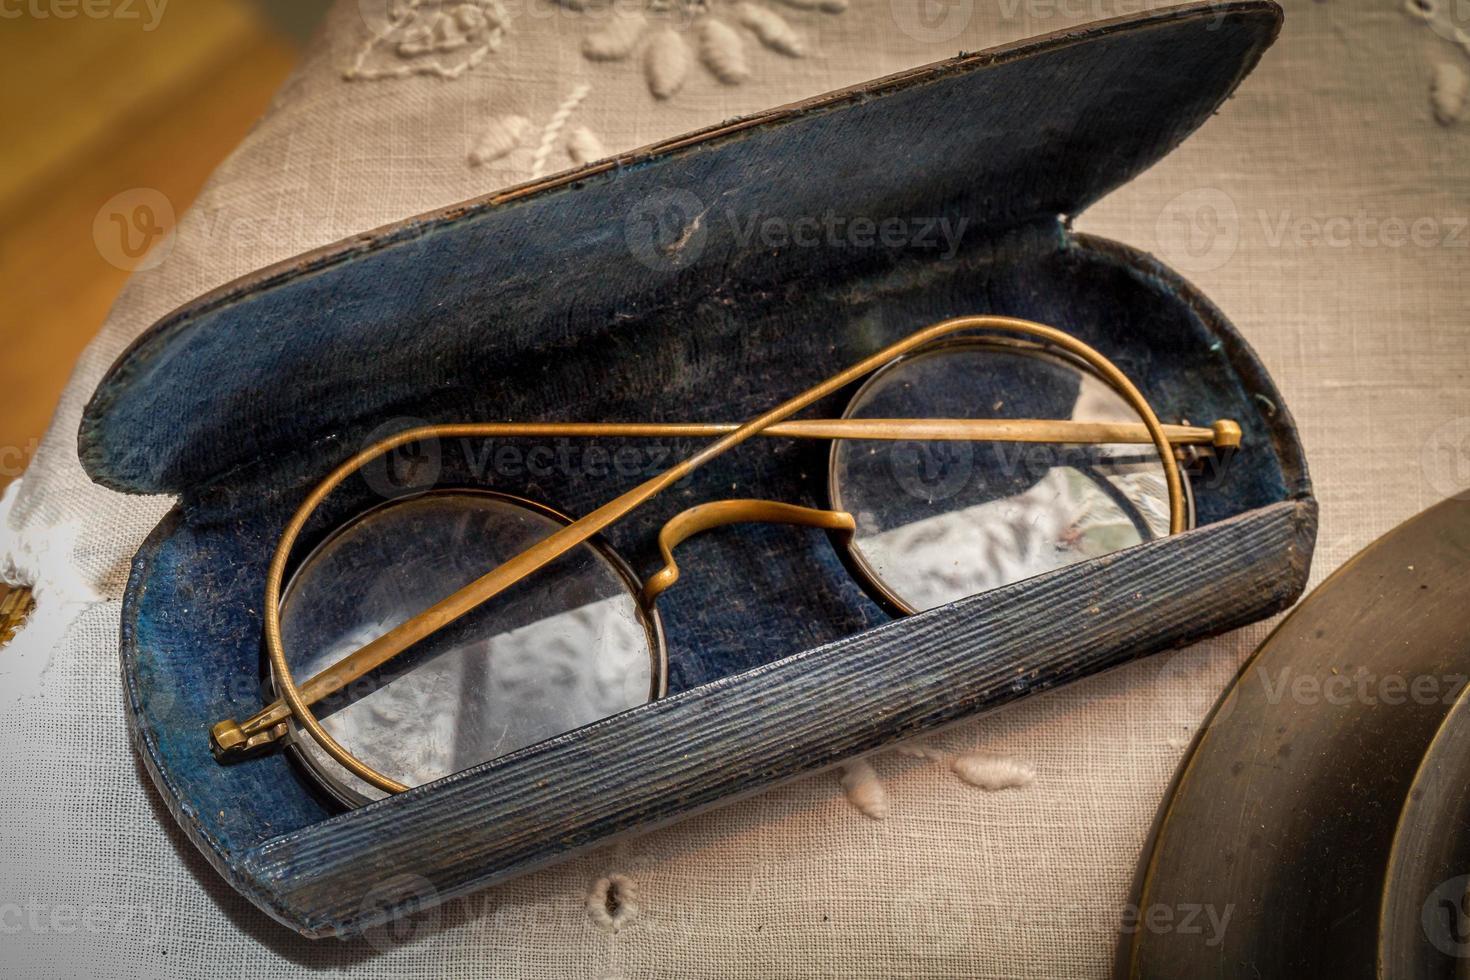 Vintage glasses close up photo